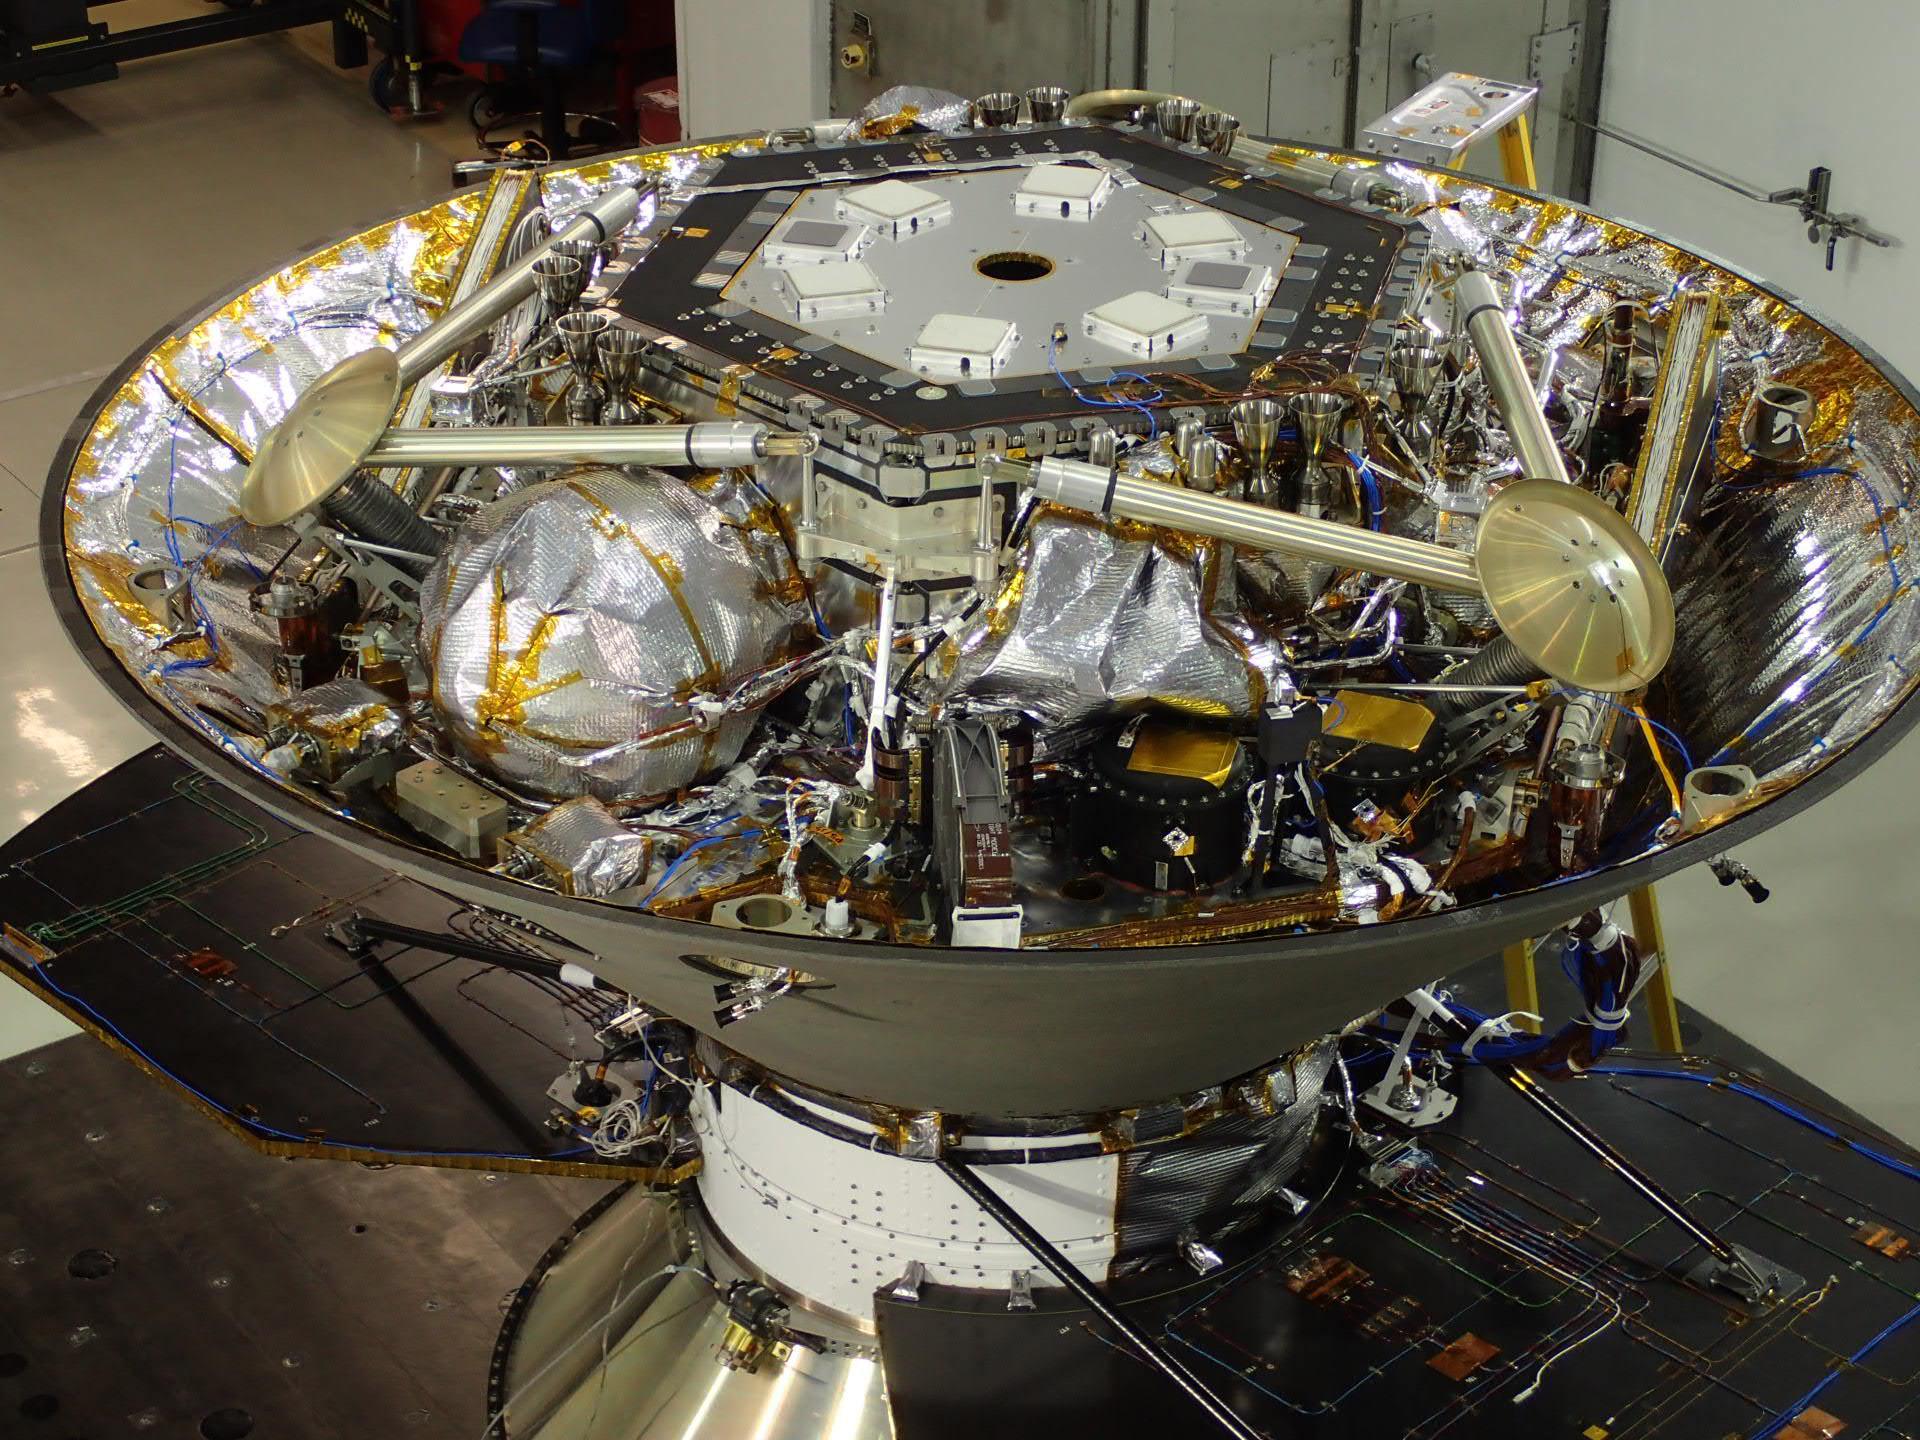 spacecraft insight - photo #4